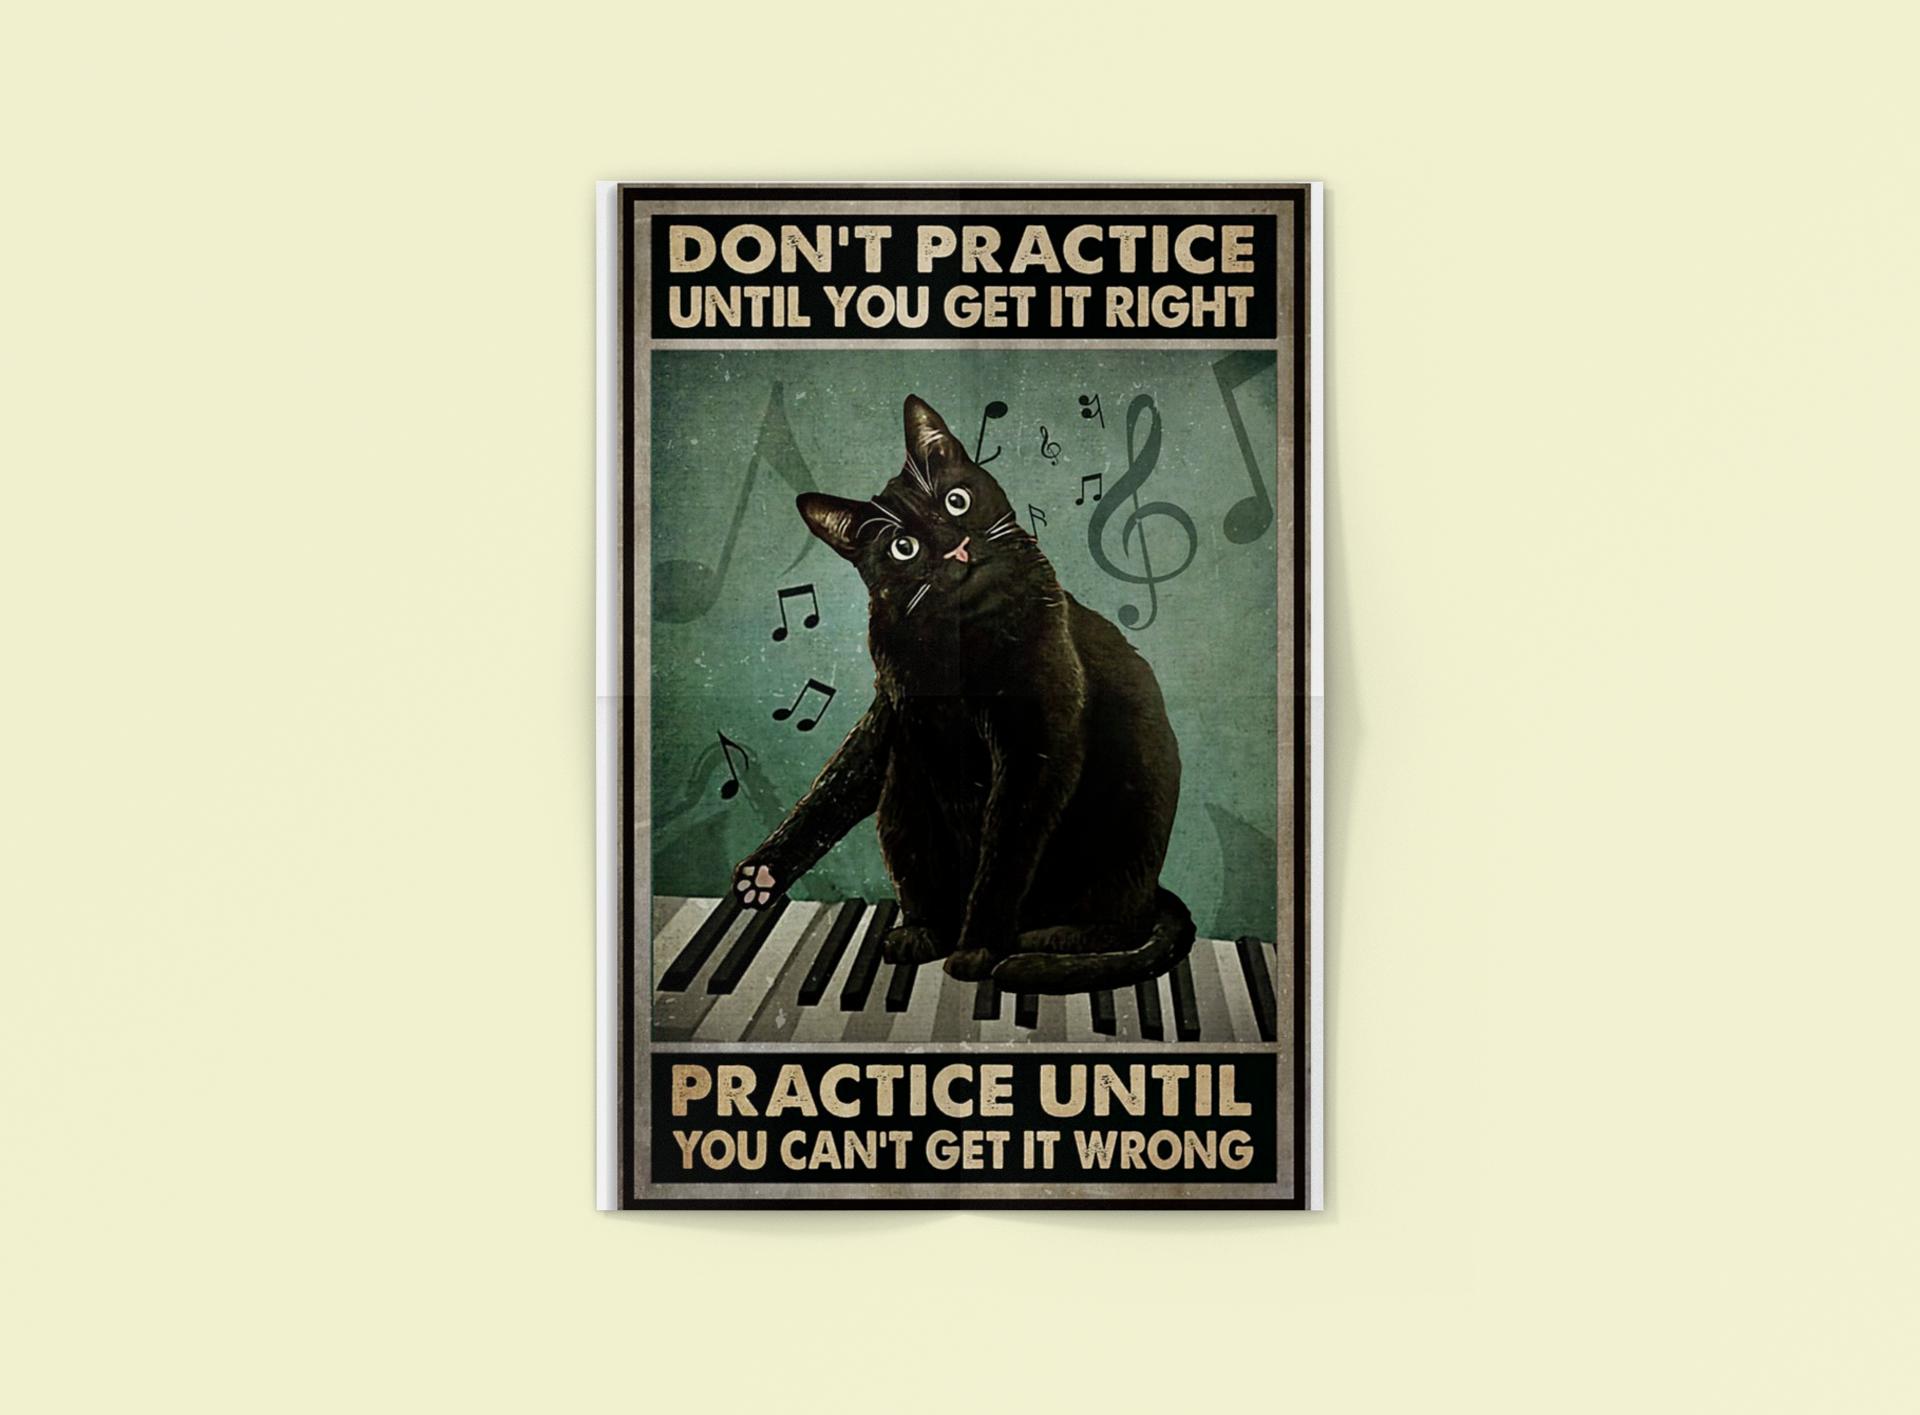 Poster Cat Don't practice until you get it right practice until you can't get it wrong 14